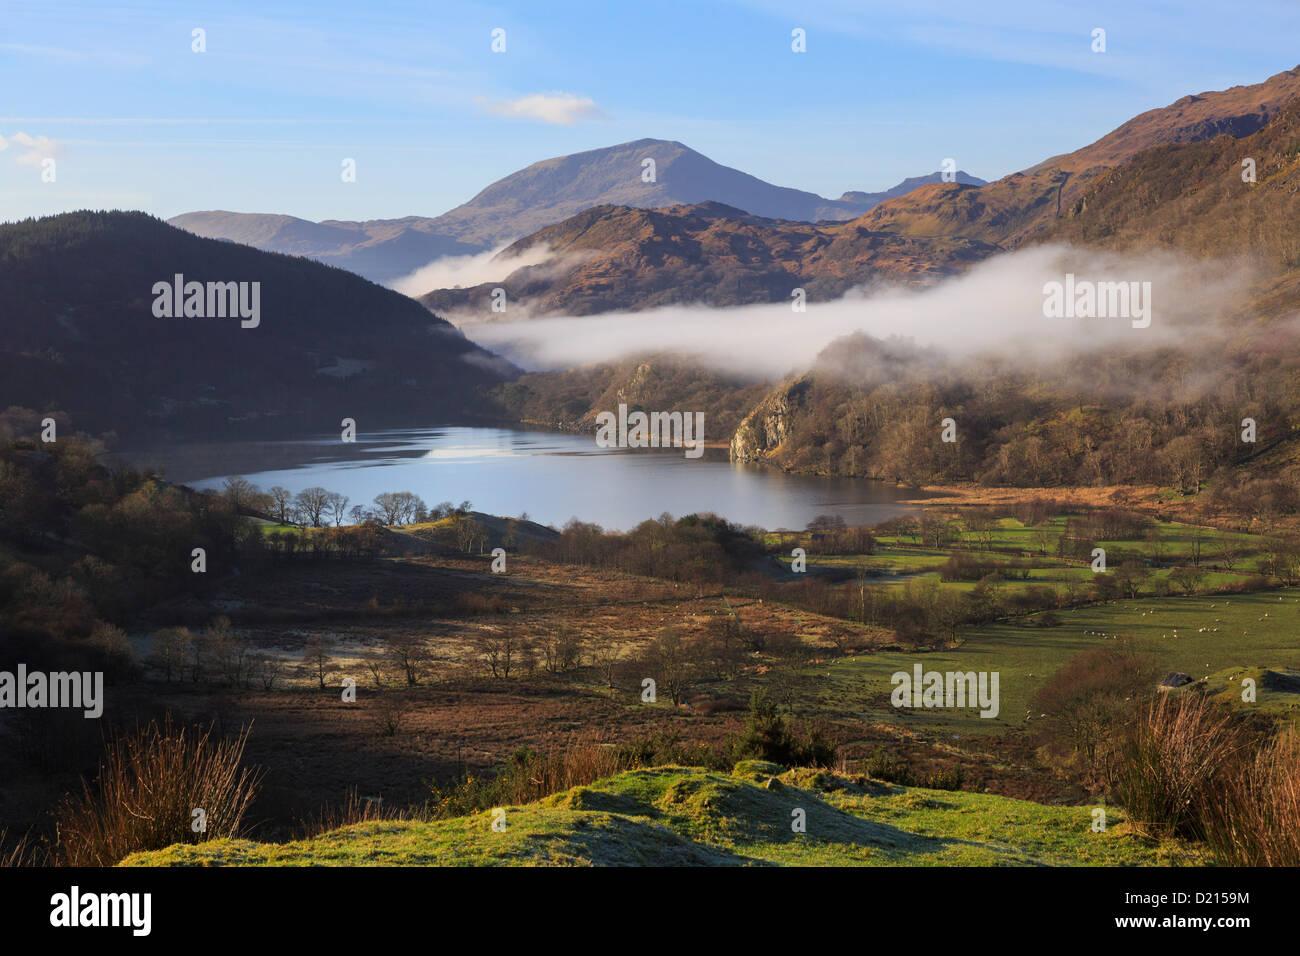 Malerische Aussicht Tal Llyn Gwynant See mit Nebel in Berge von Snowdonia National Park, Nantgwynant, North Wales, Stockbild